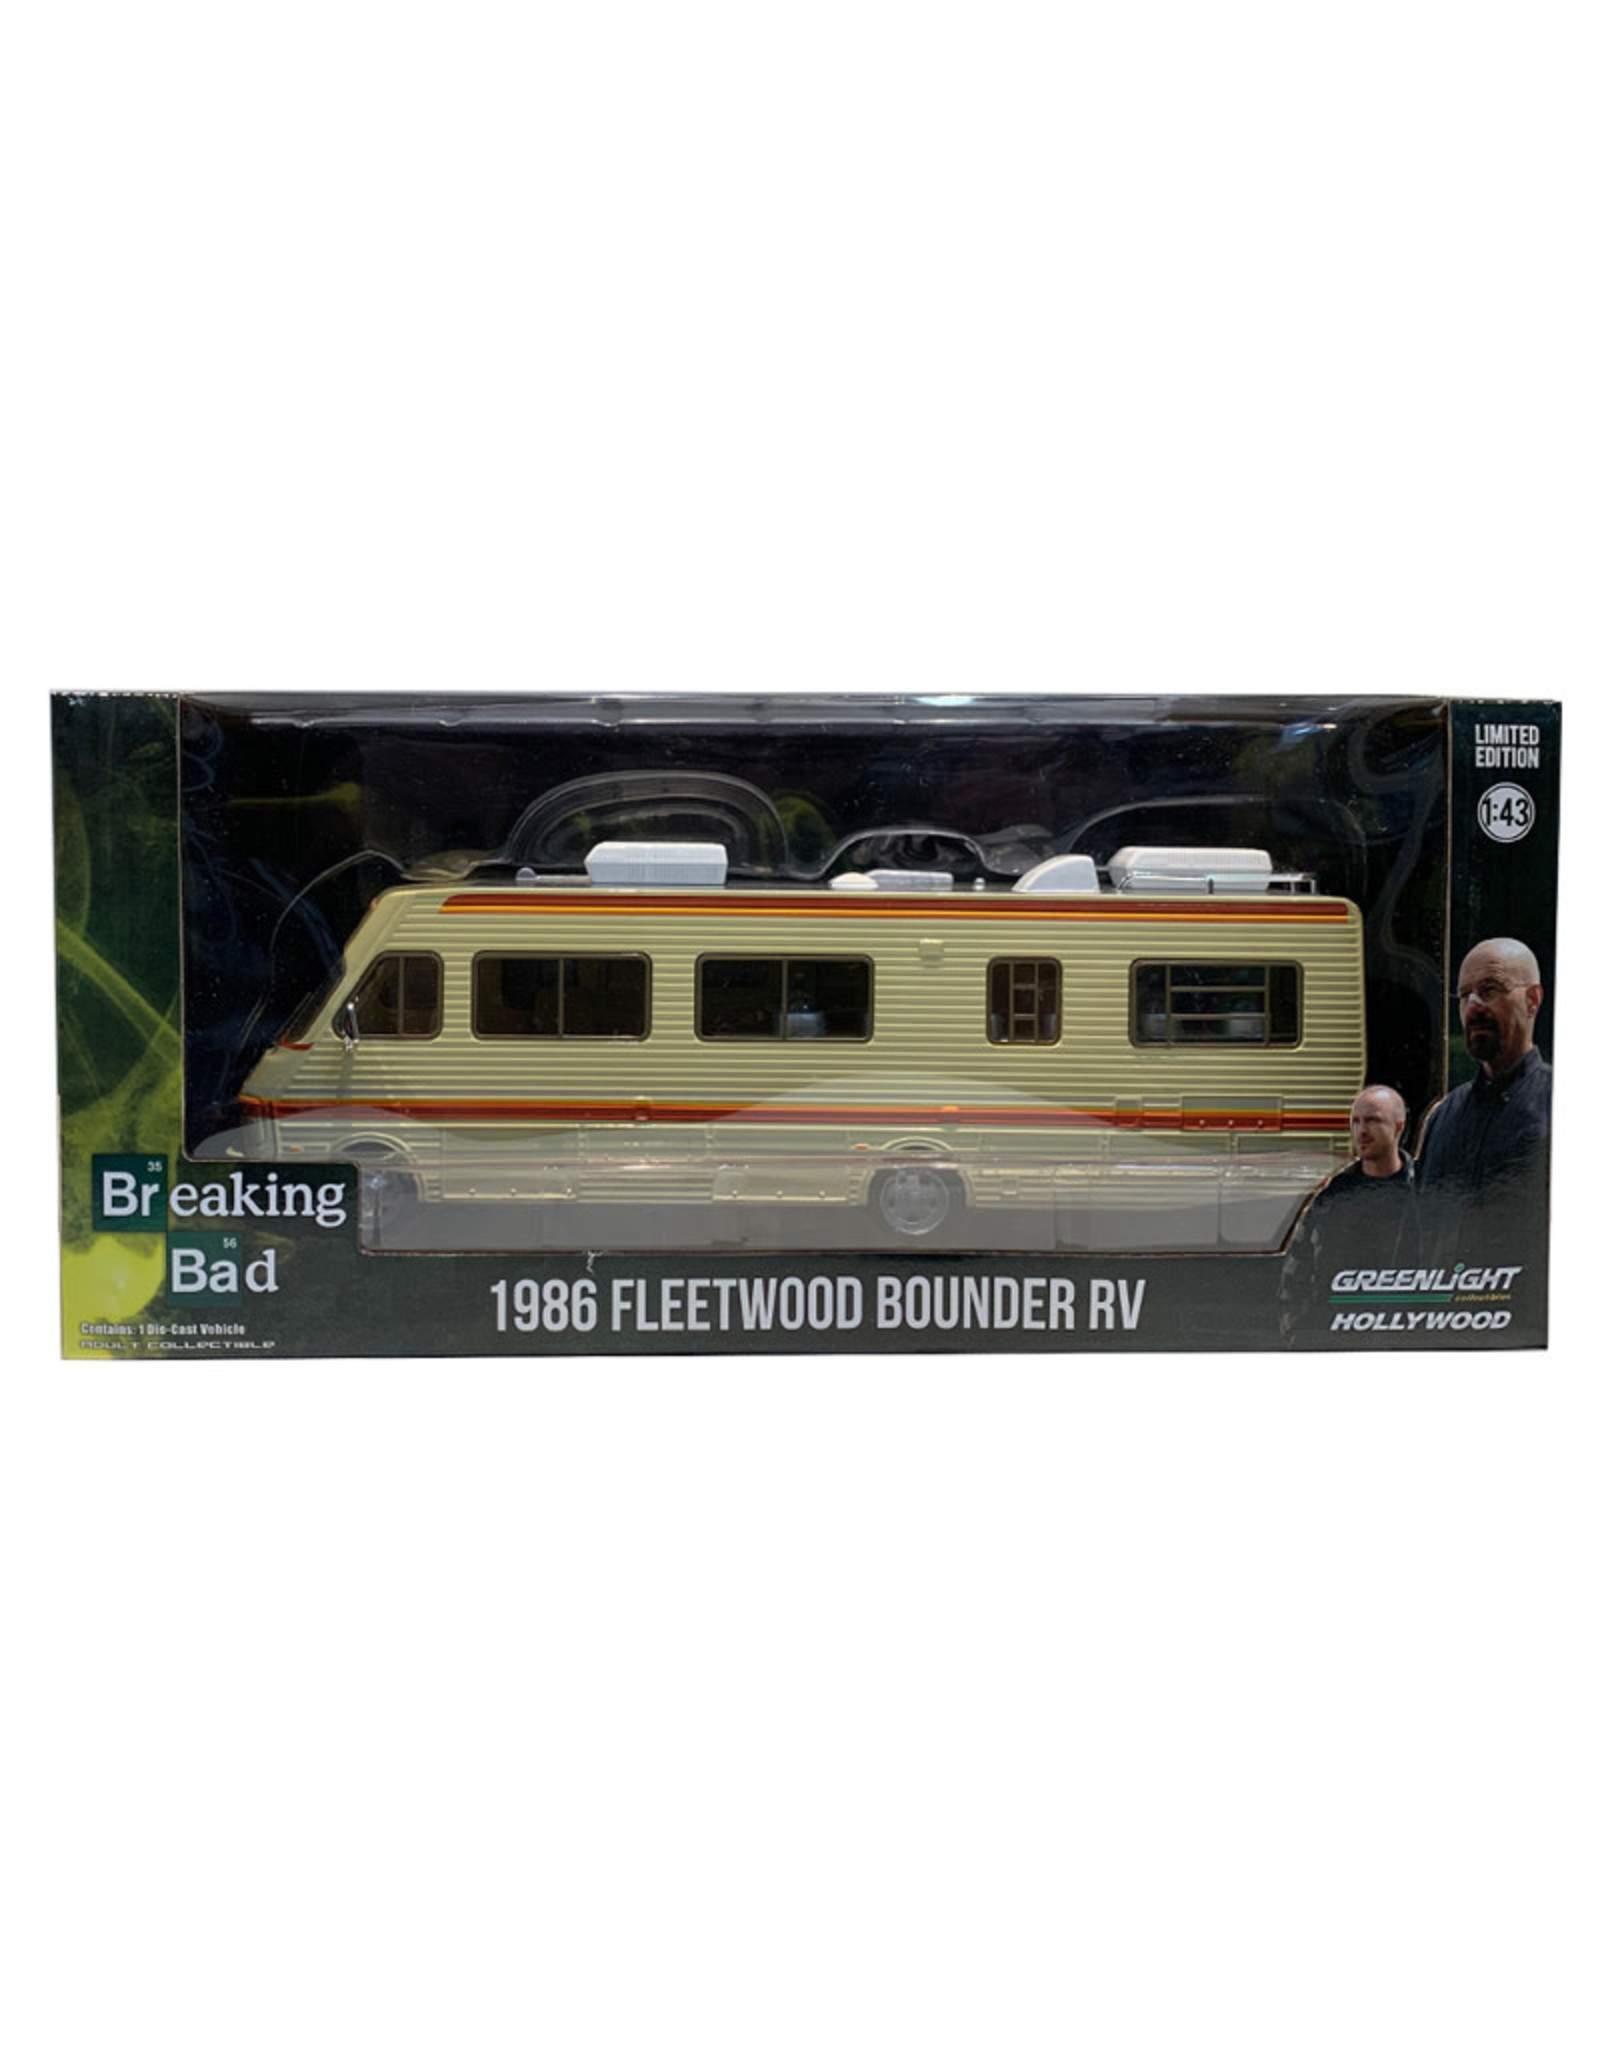 Breaking Bad ( Voiture miniature ) 1986 Fleetwood Bounder Rv